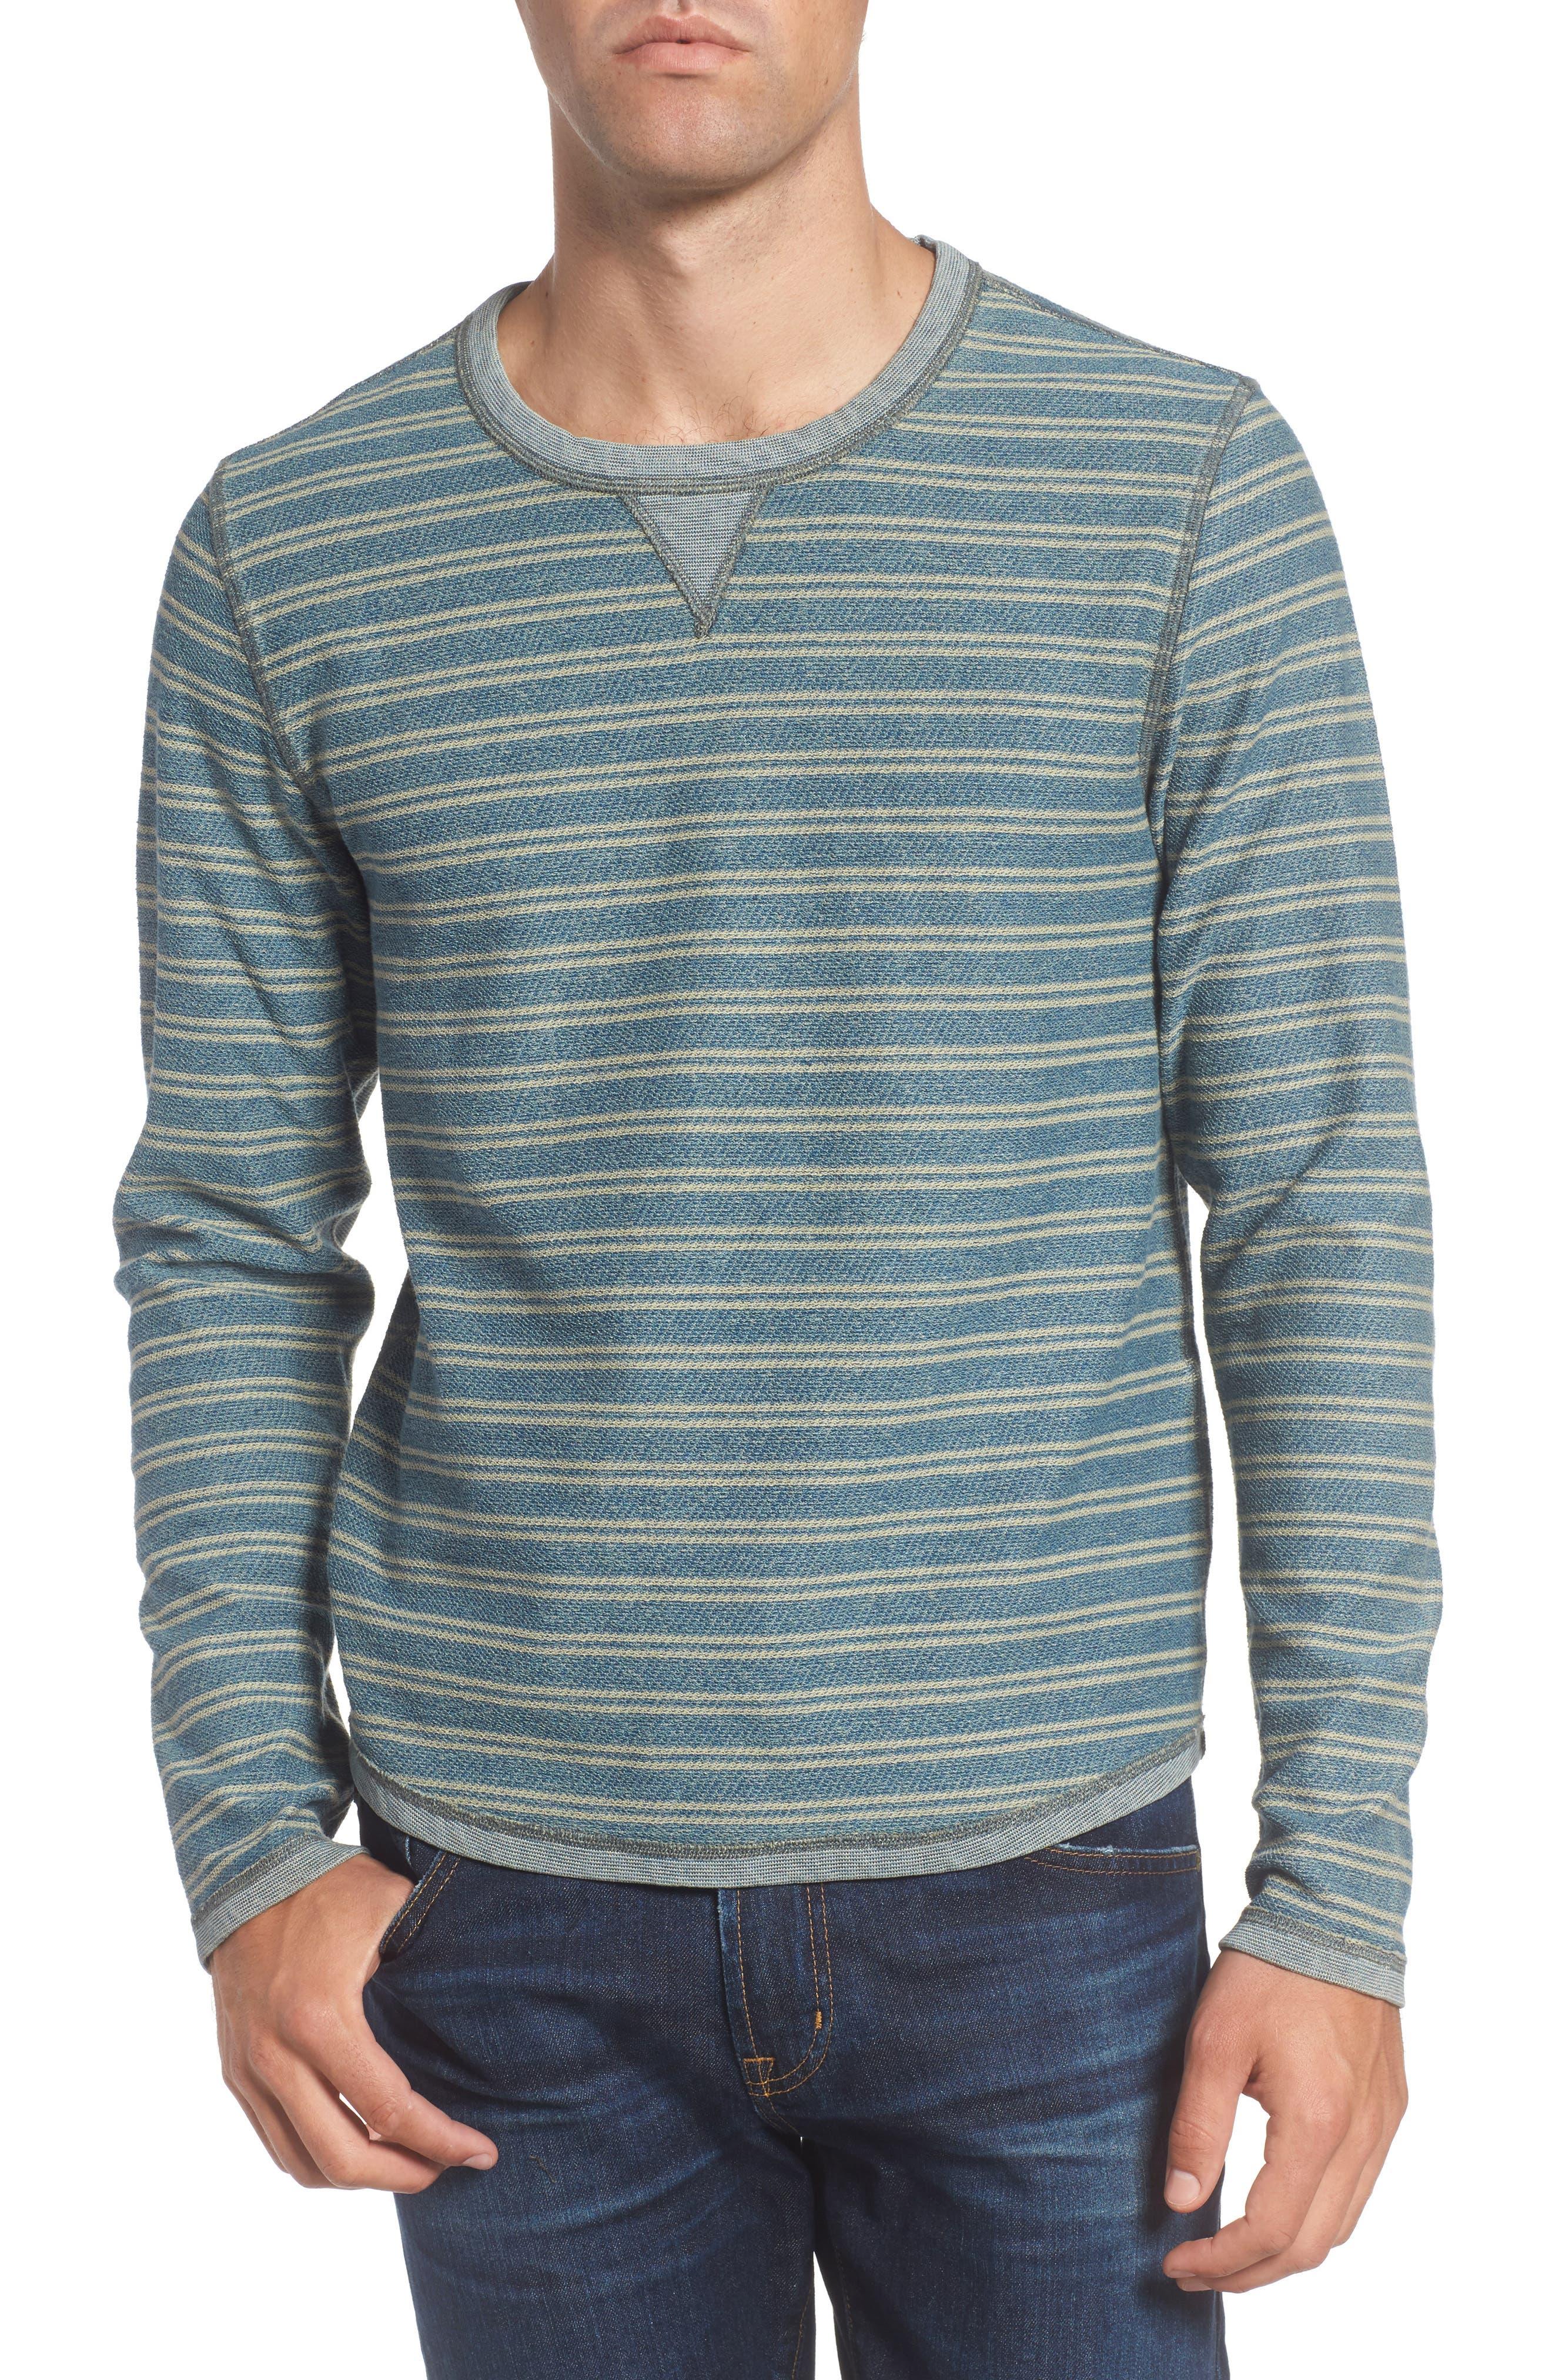 Strickland Reversible Crewneck Sweatshirt,                         Main,                         color, Aspen Heather